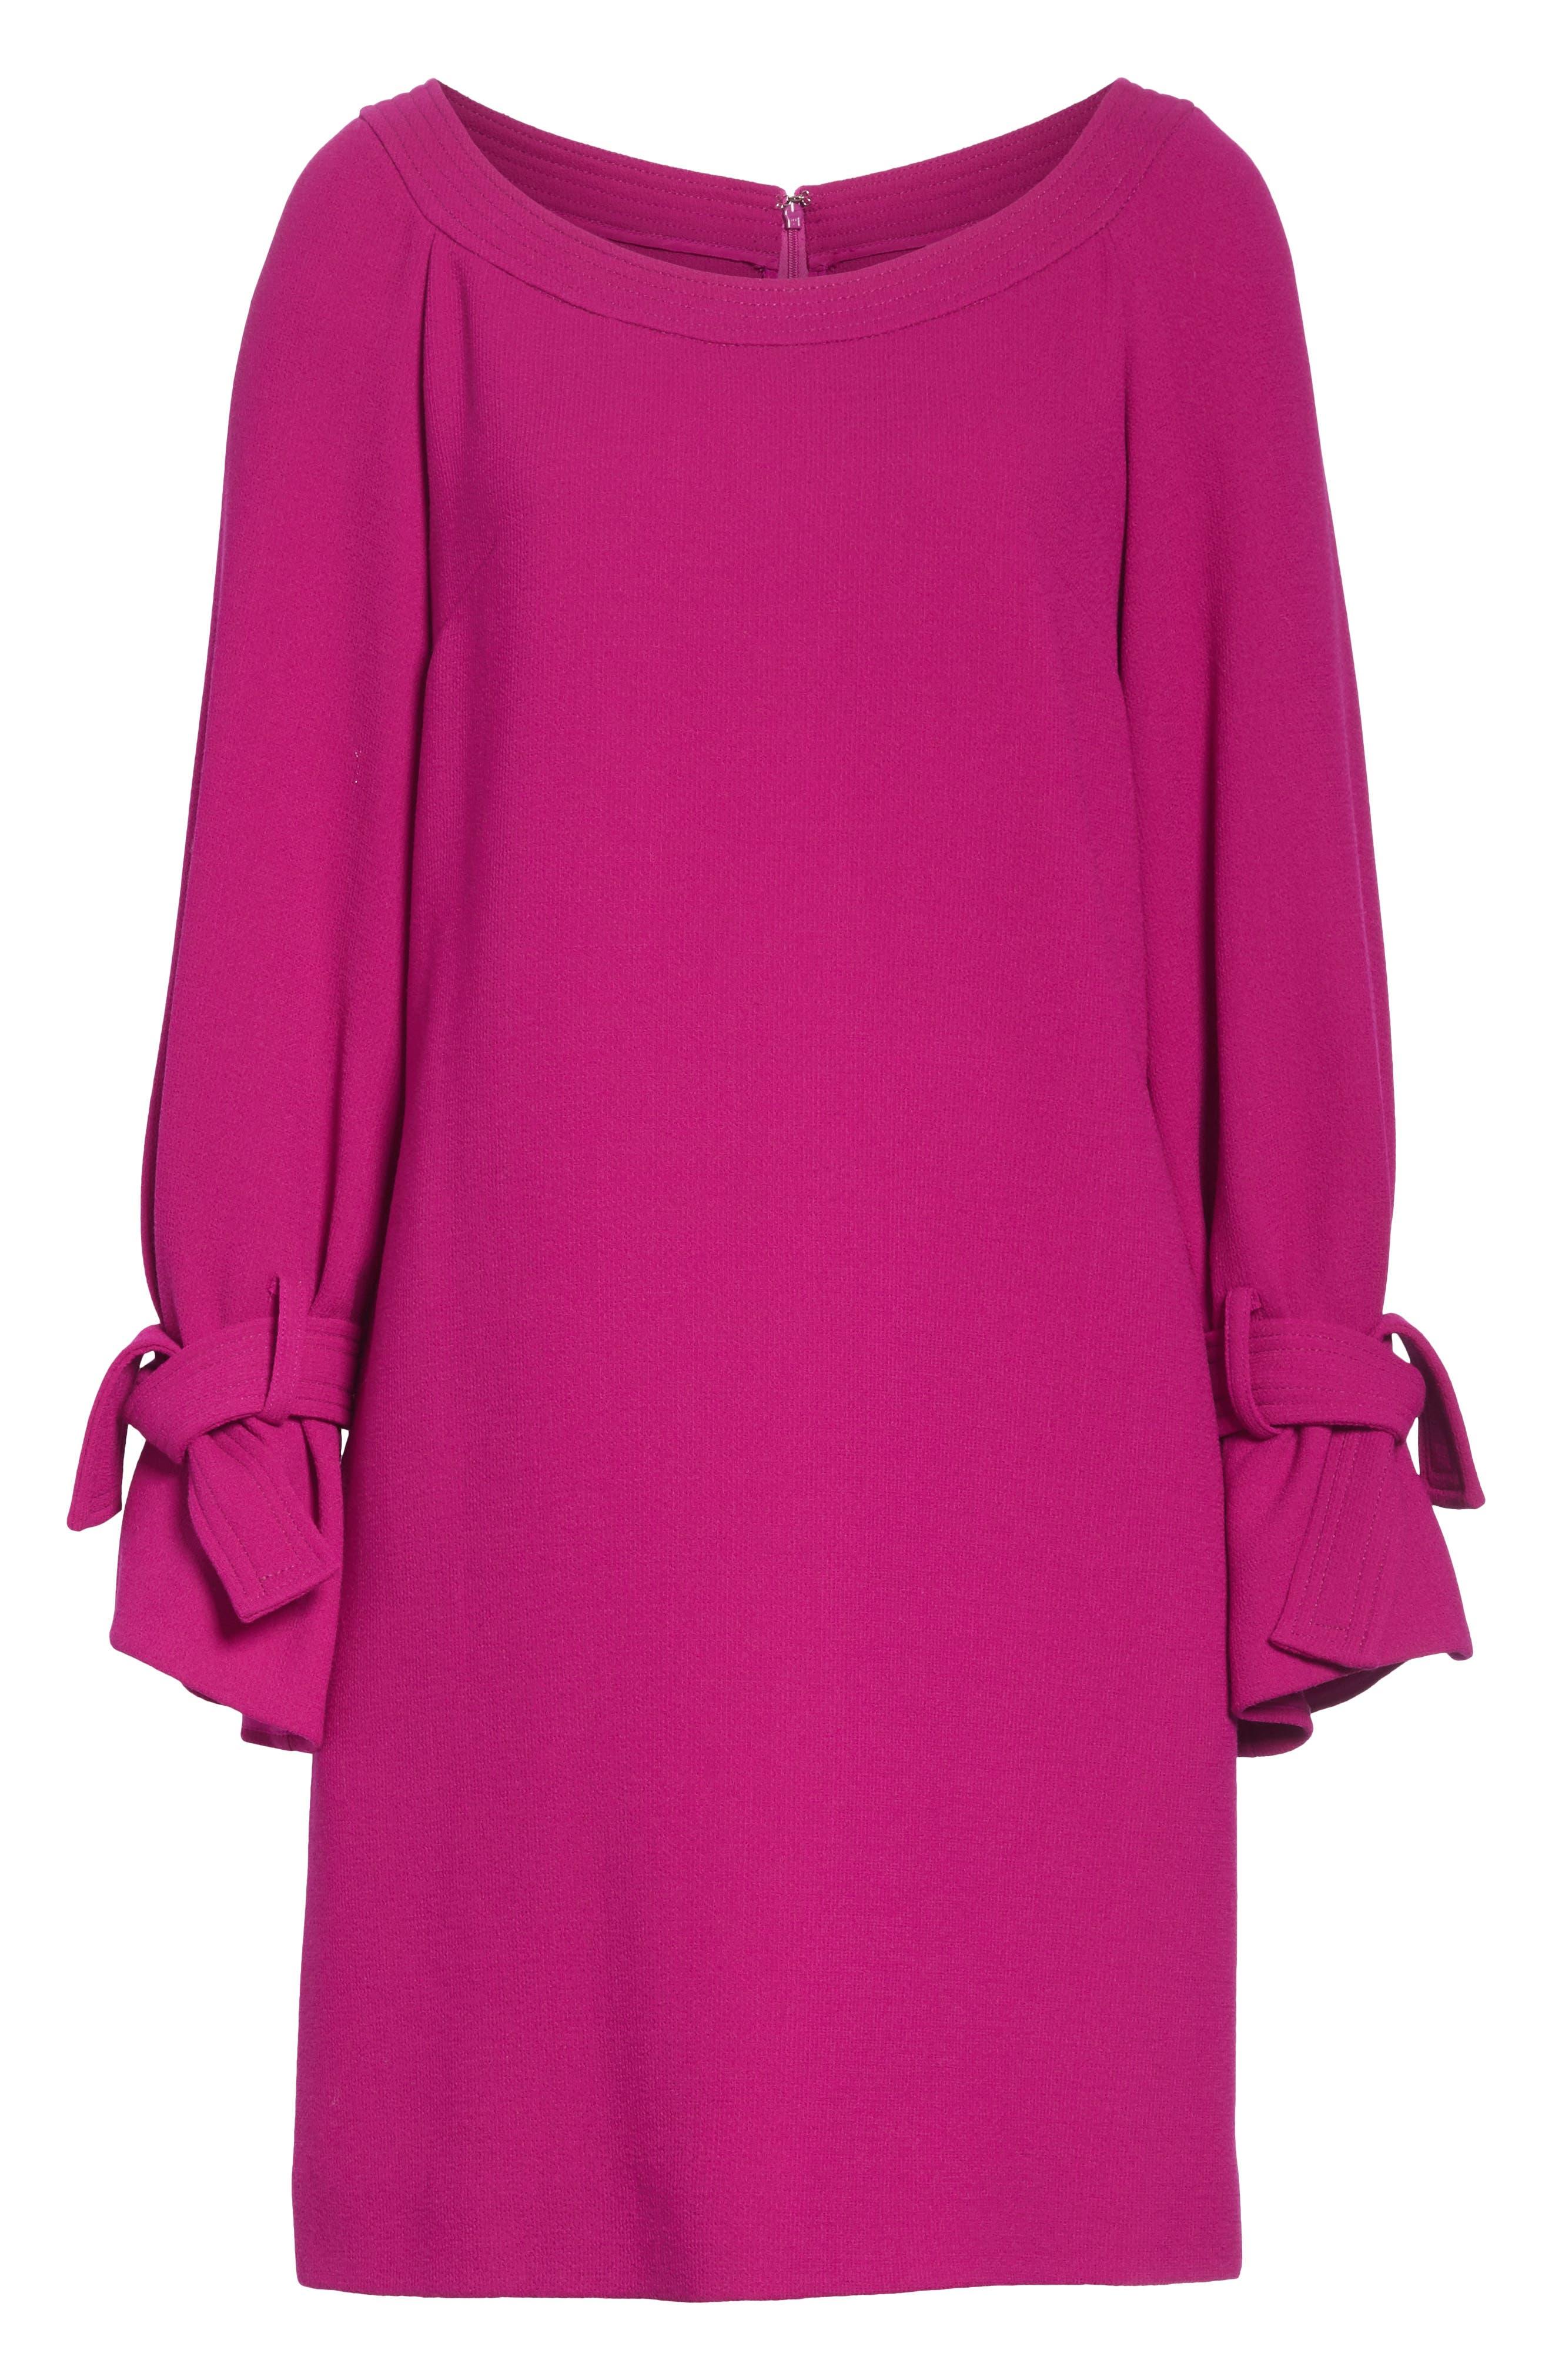 LELA ROSE, Tie Cuff Wool Blend Crepe Shift Dress, Alternate thumbnail 7, color, MAGENTA